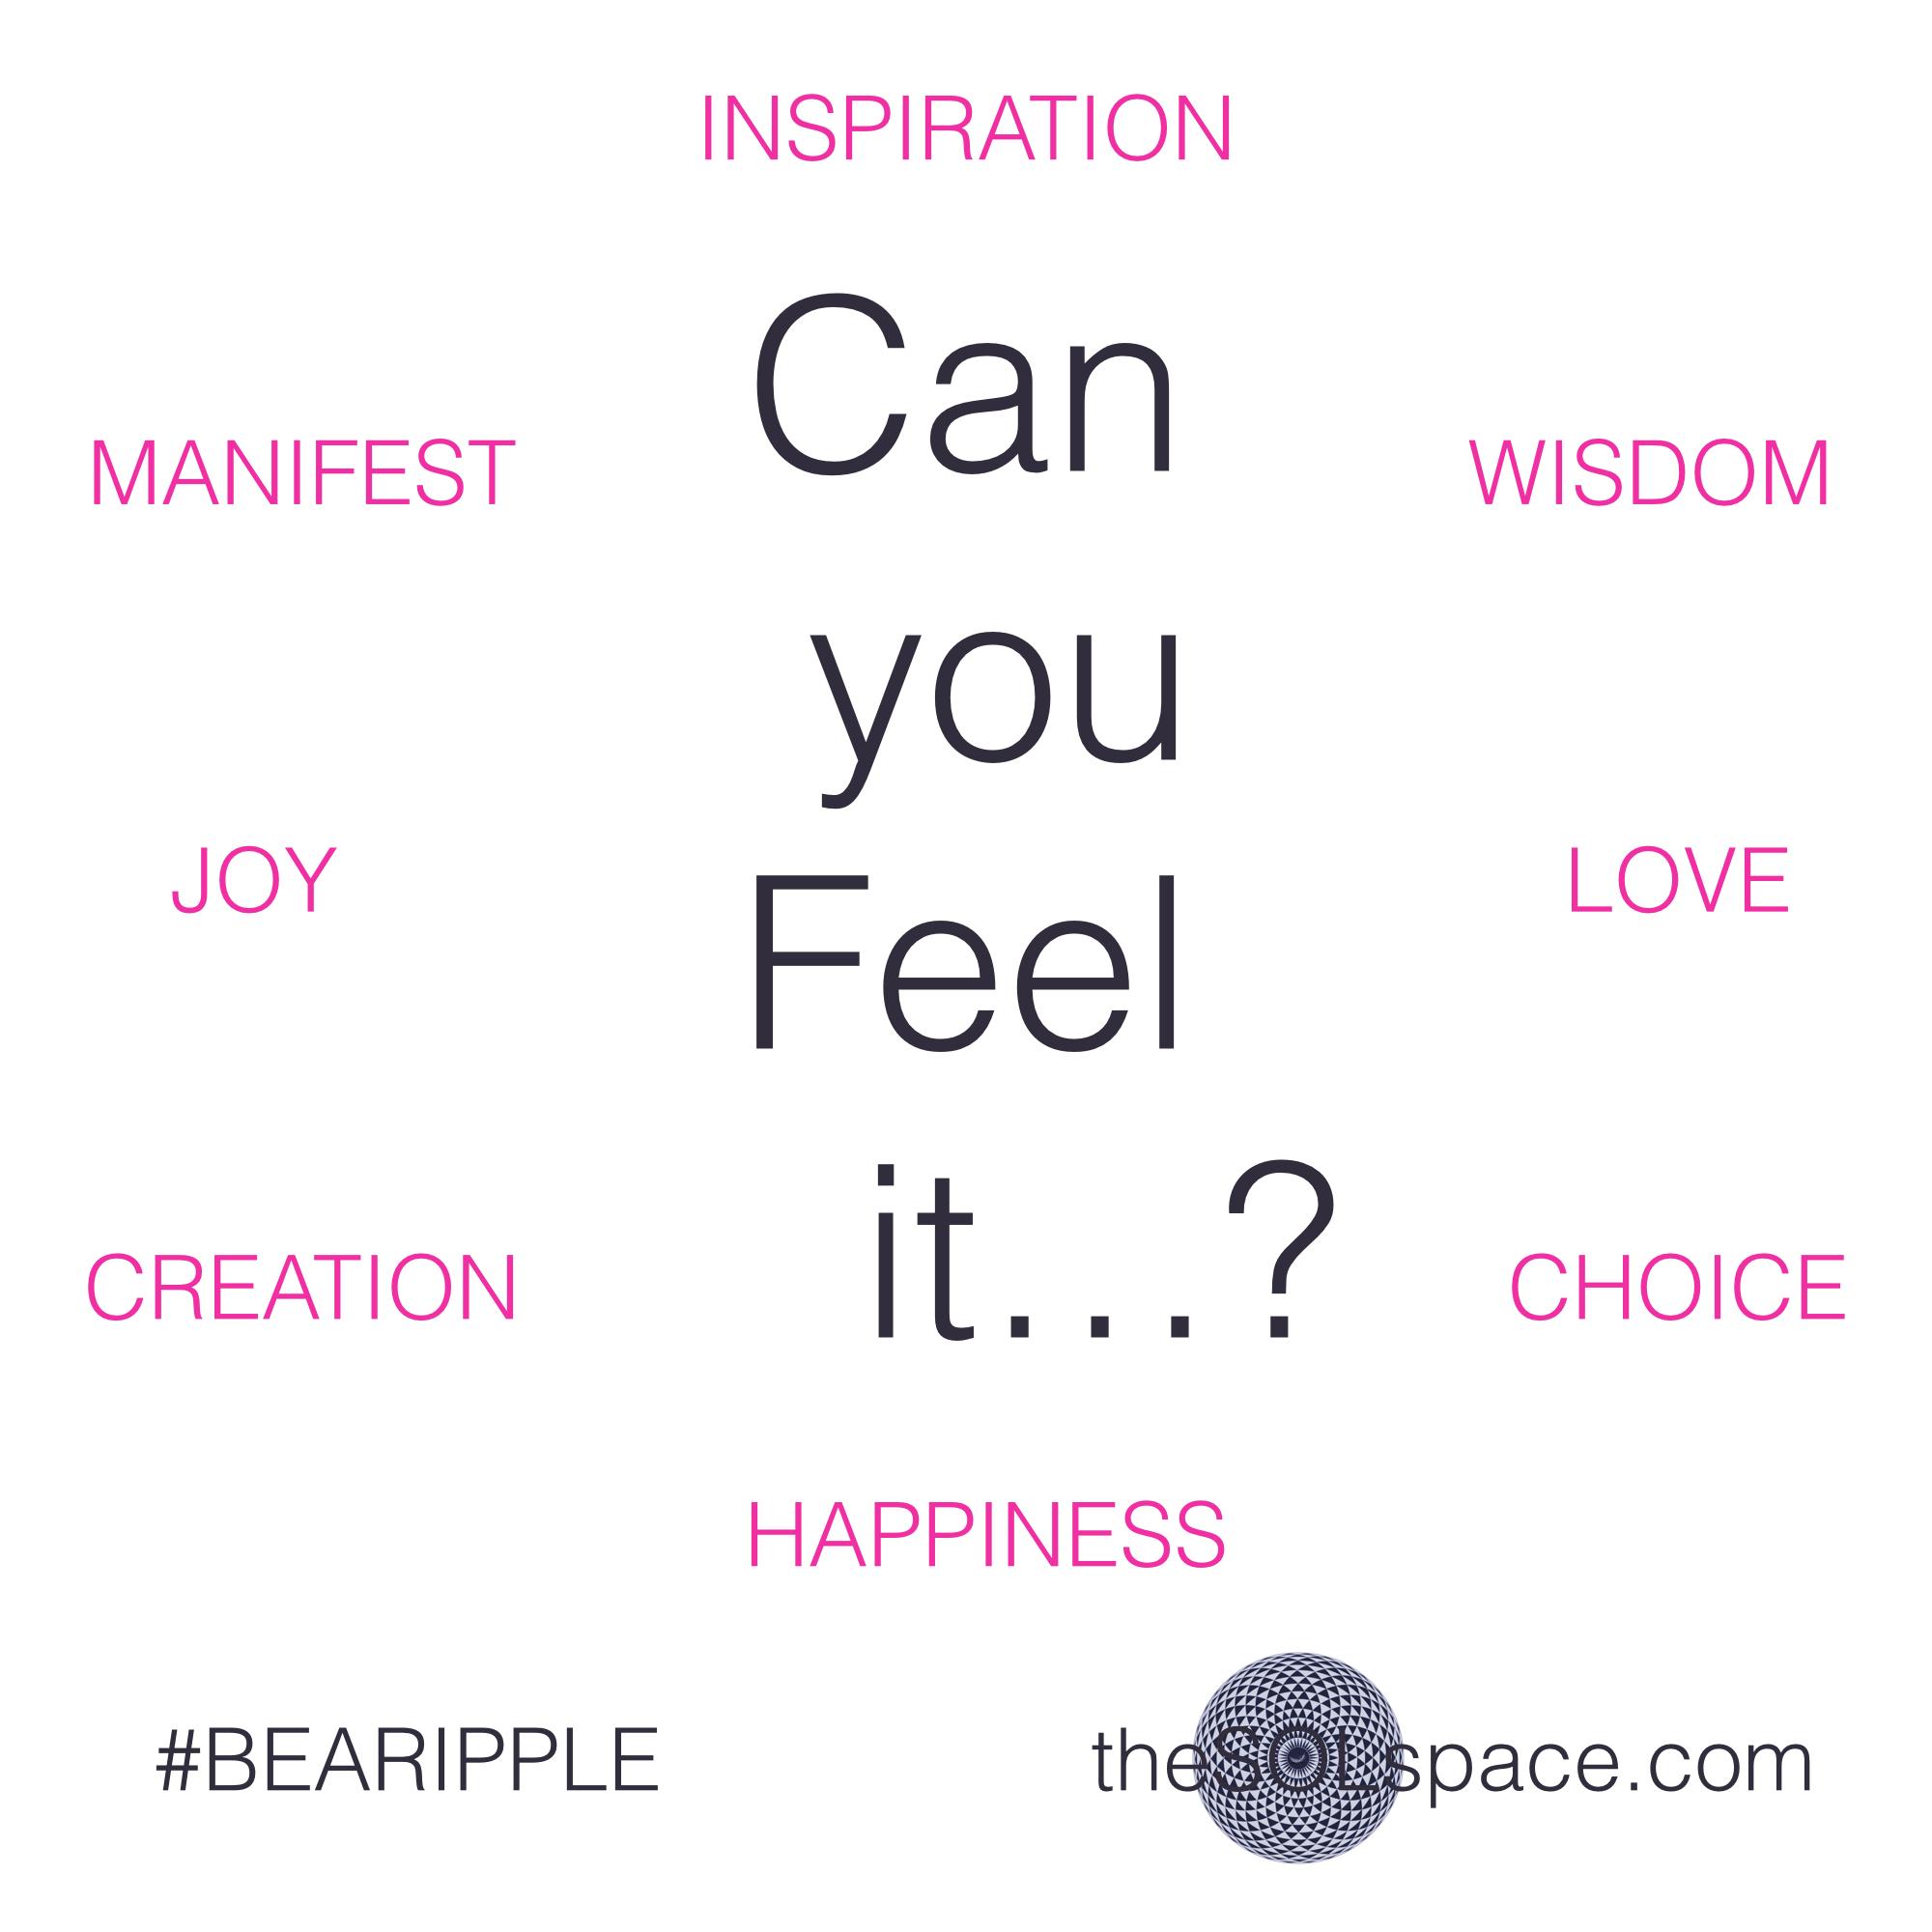 #BeARipple..Can you FEEL it...? Manifest, Joy, Creation, Inspiration, Wisdom, Love, Choice, Happiness